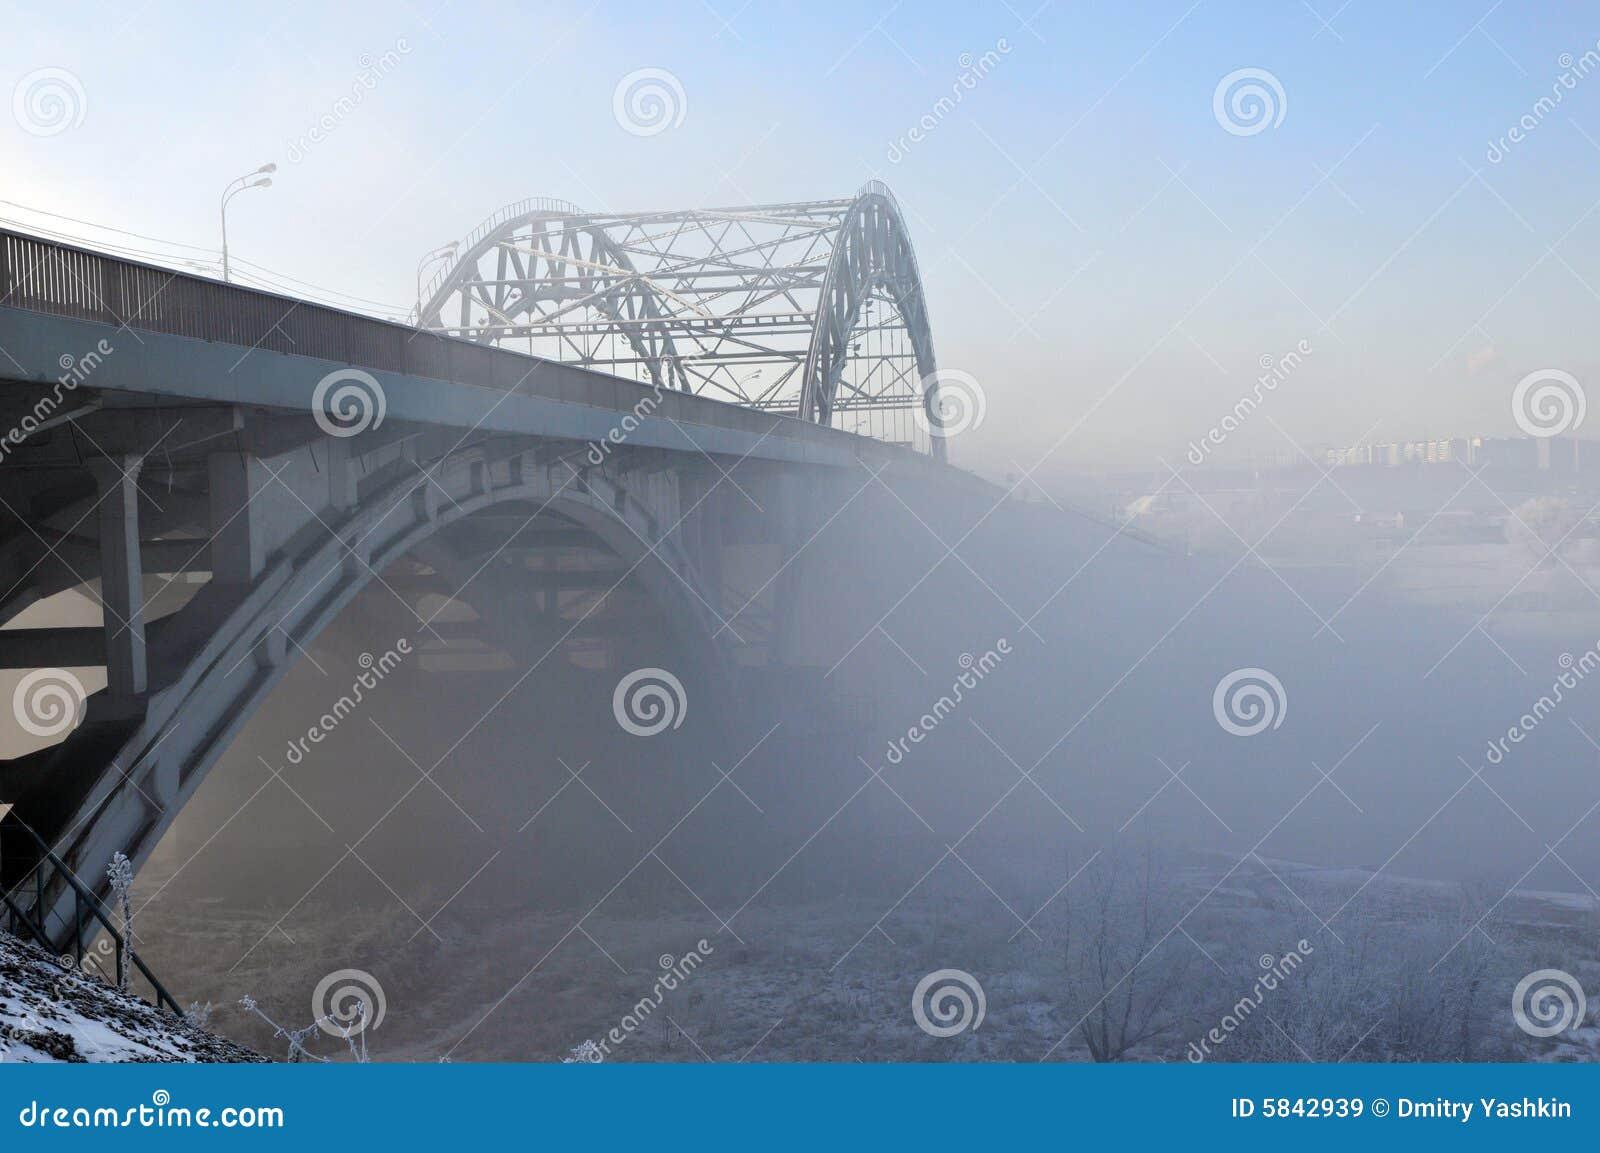 Support of the bridge